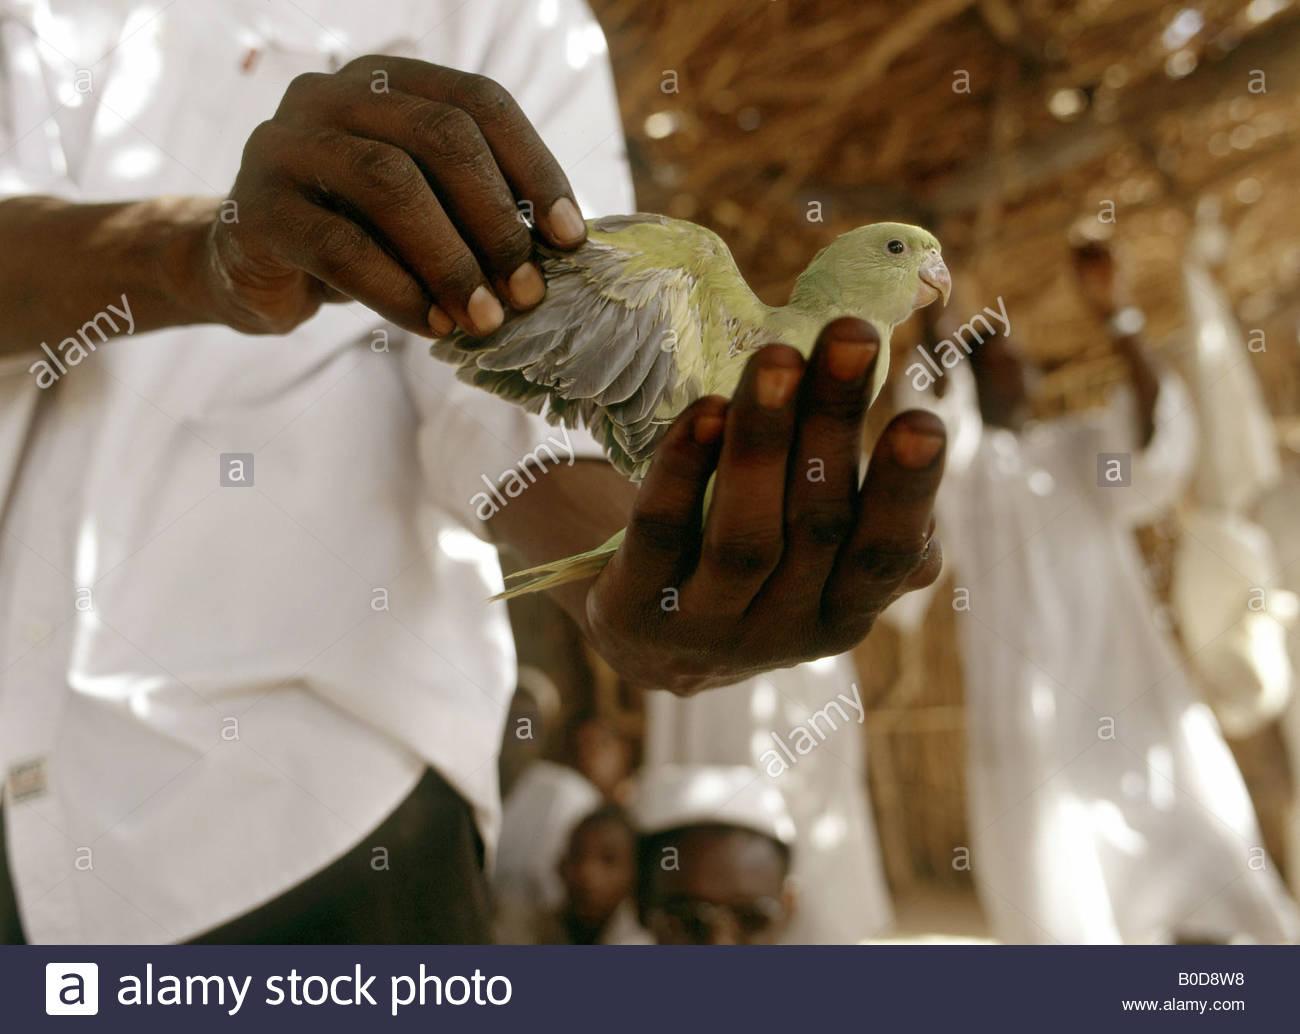 quail muslim single men Meet people looking for black muslim singles on lovehabibi - the top destination for single black muslims around the world.